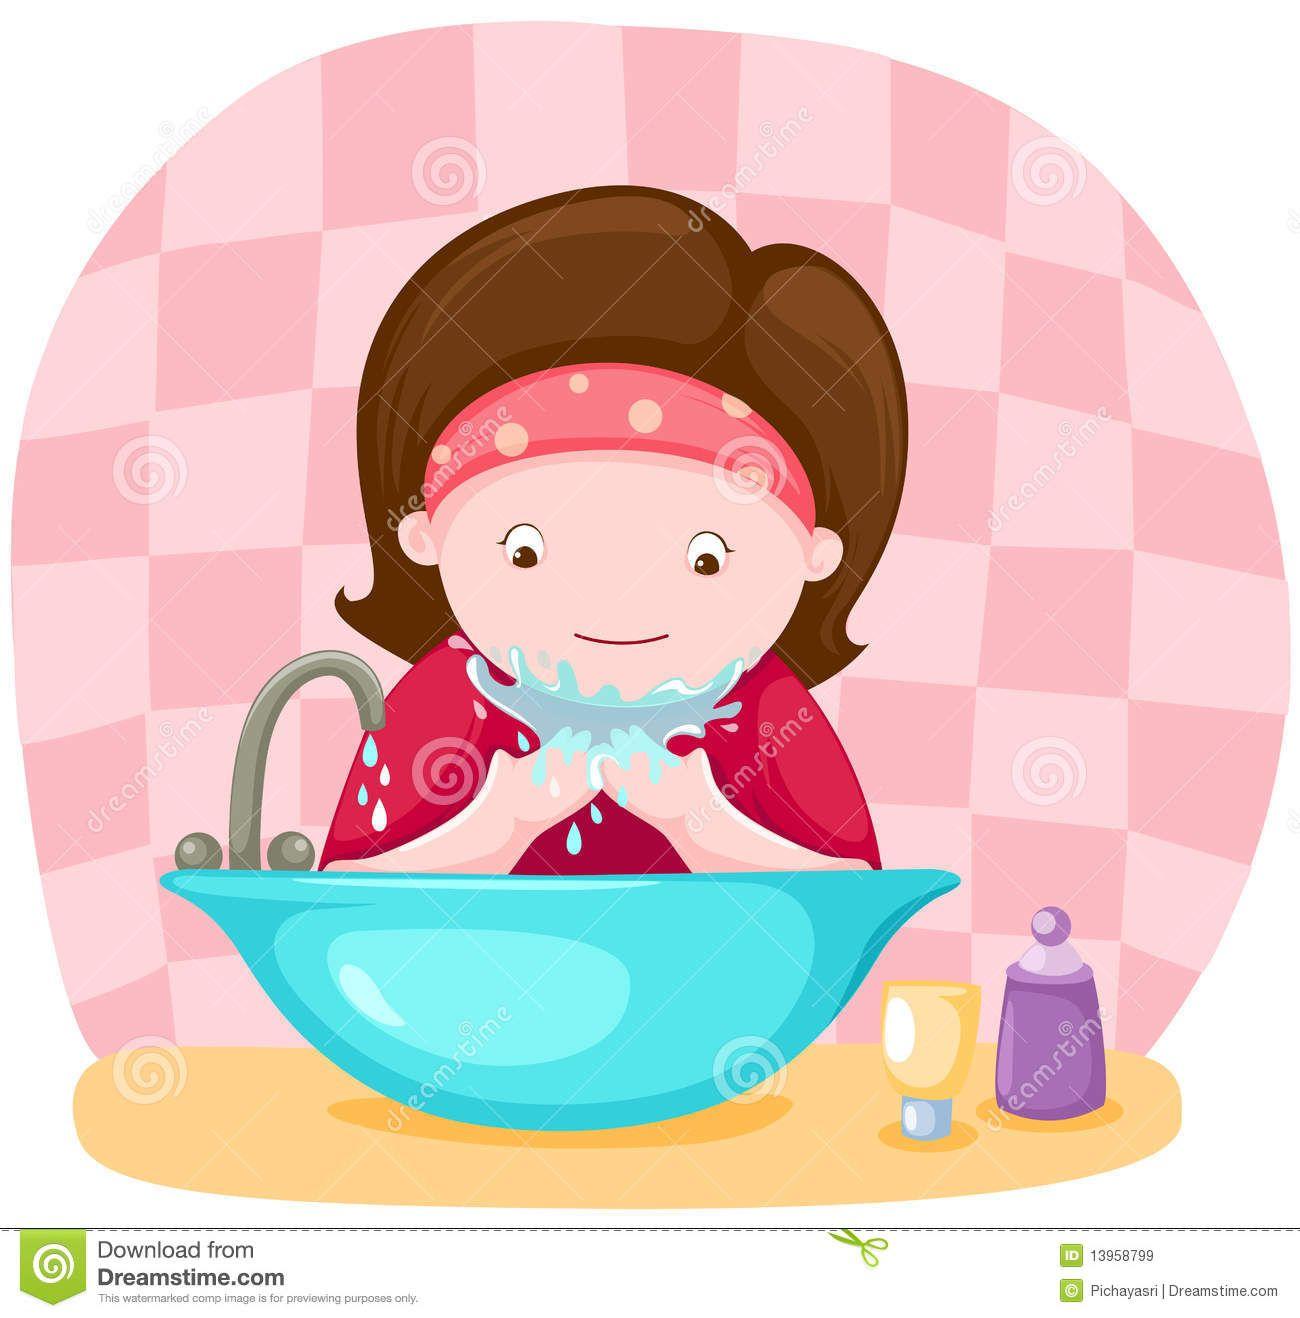 wash face clipart - Google Search | Ambientacion de aula ...